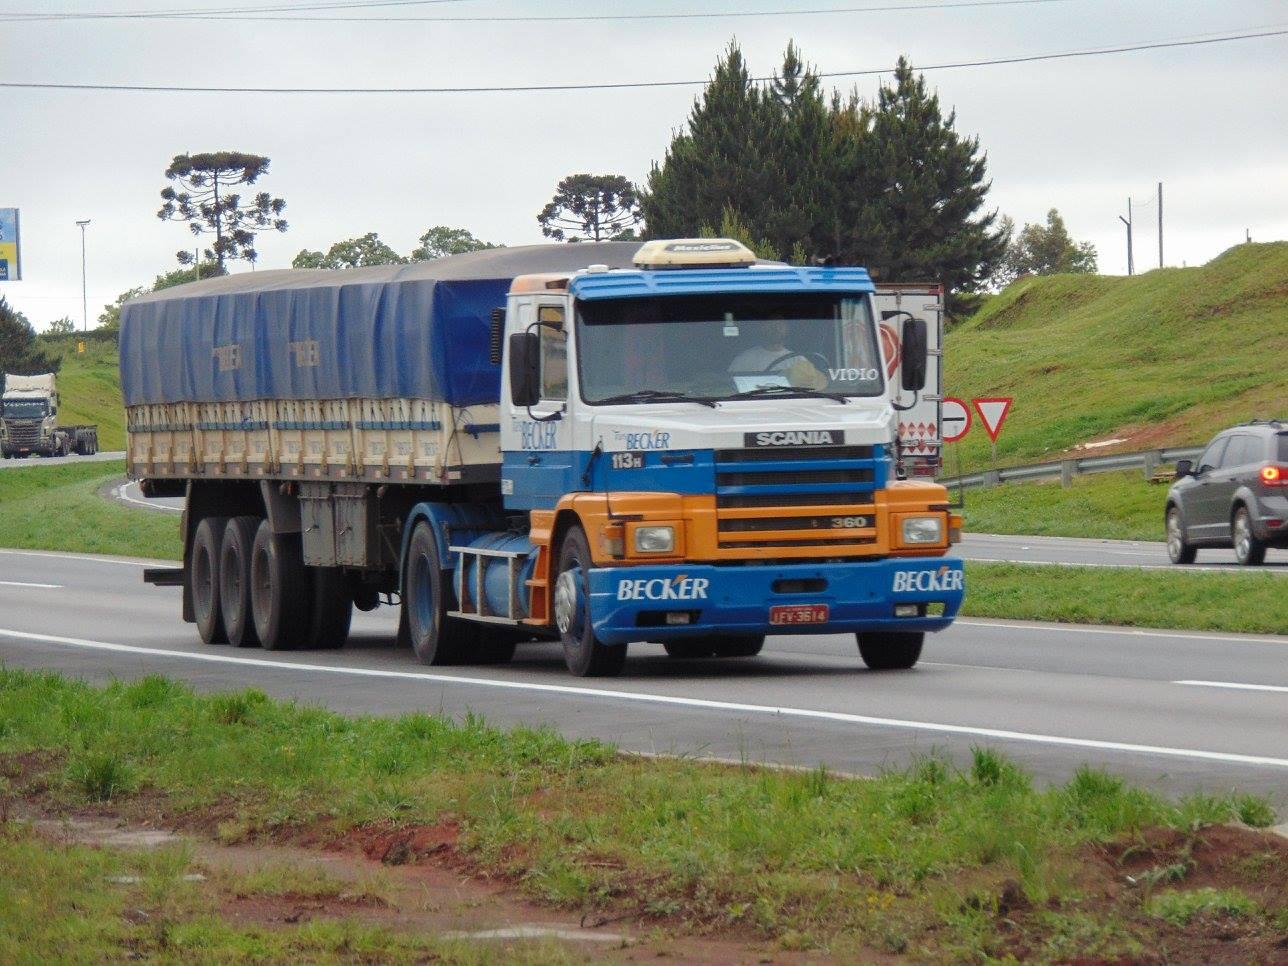 Scania-photo-5-1--2015-1